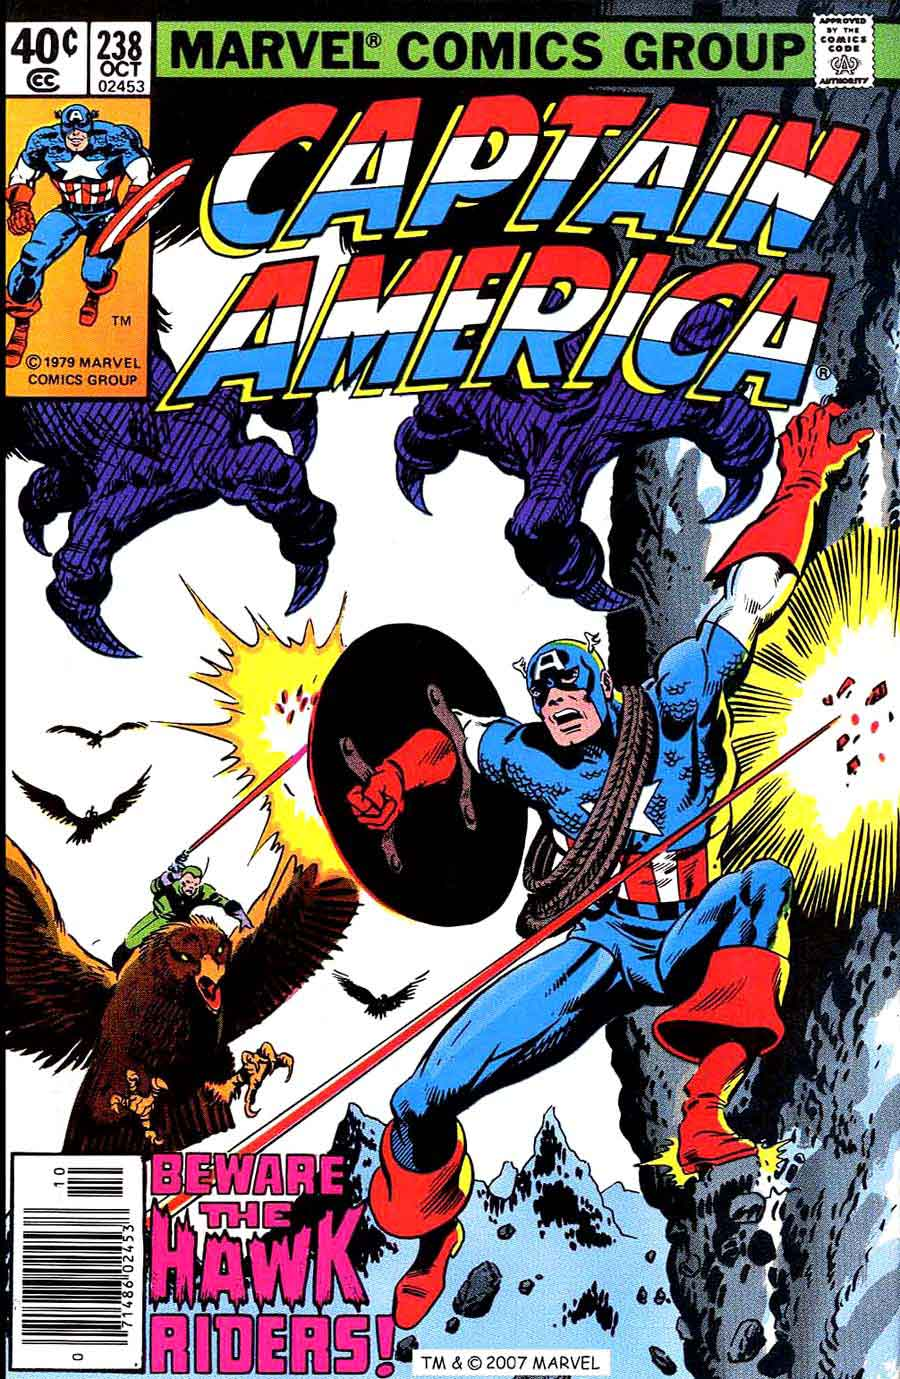 Captain America #238 marvel 1970s bronze age comic book cover art by John Byrne